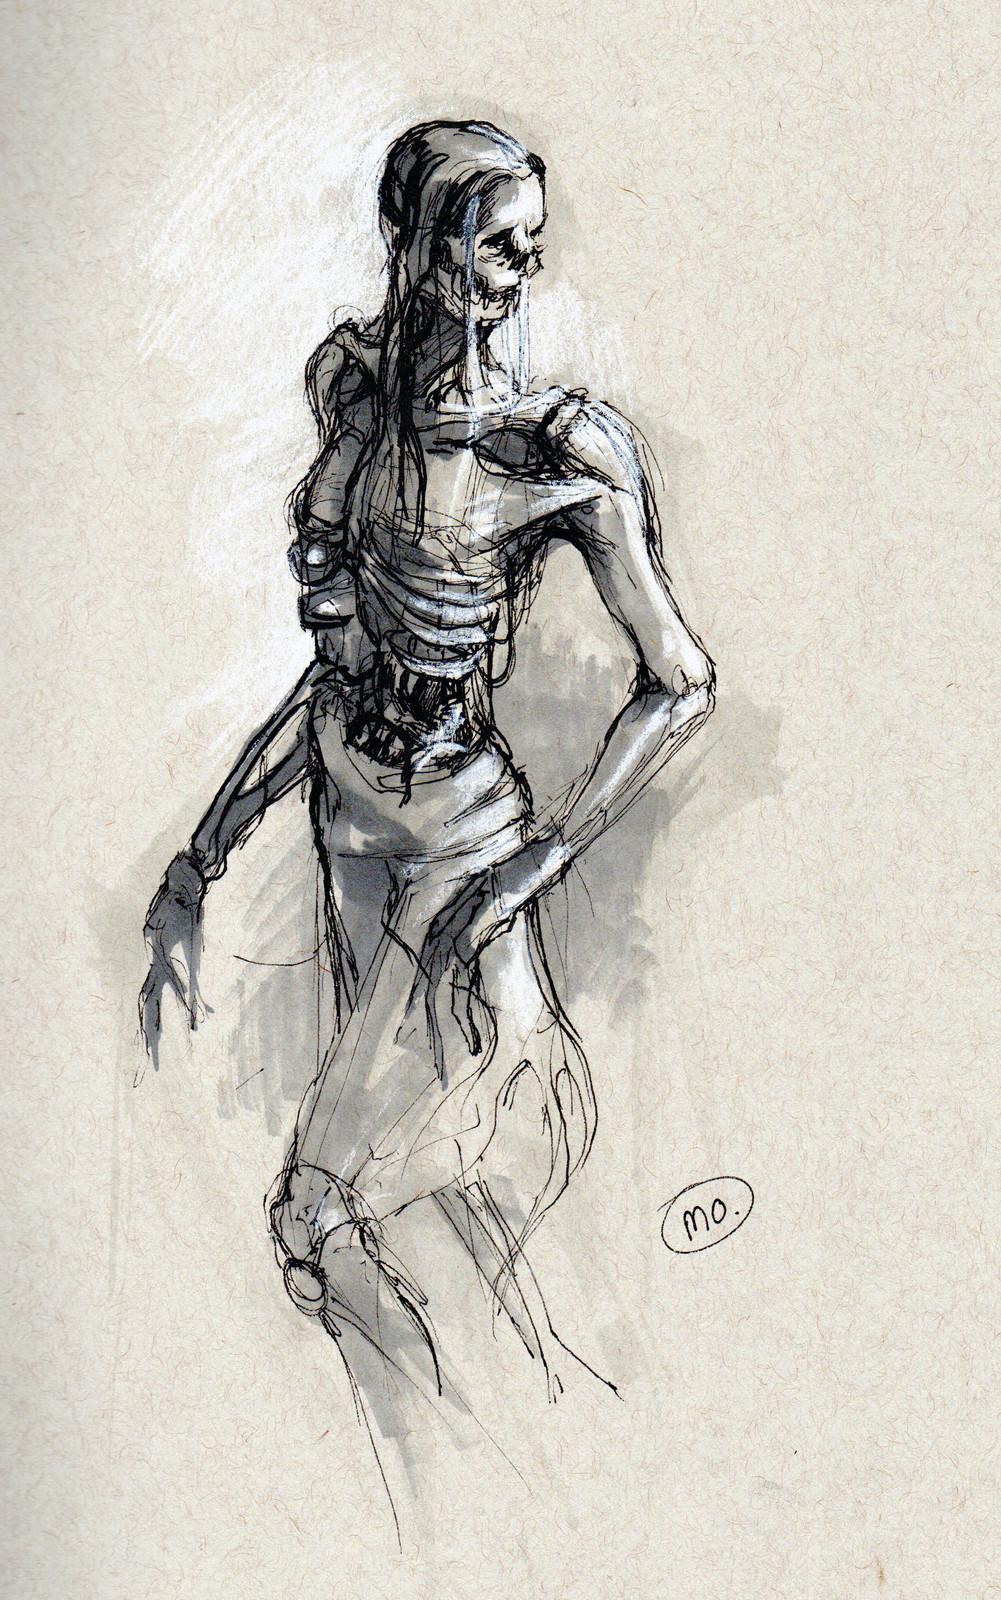 Undead sketch